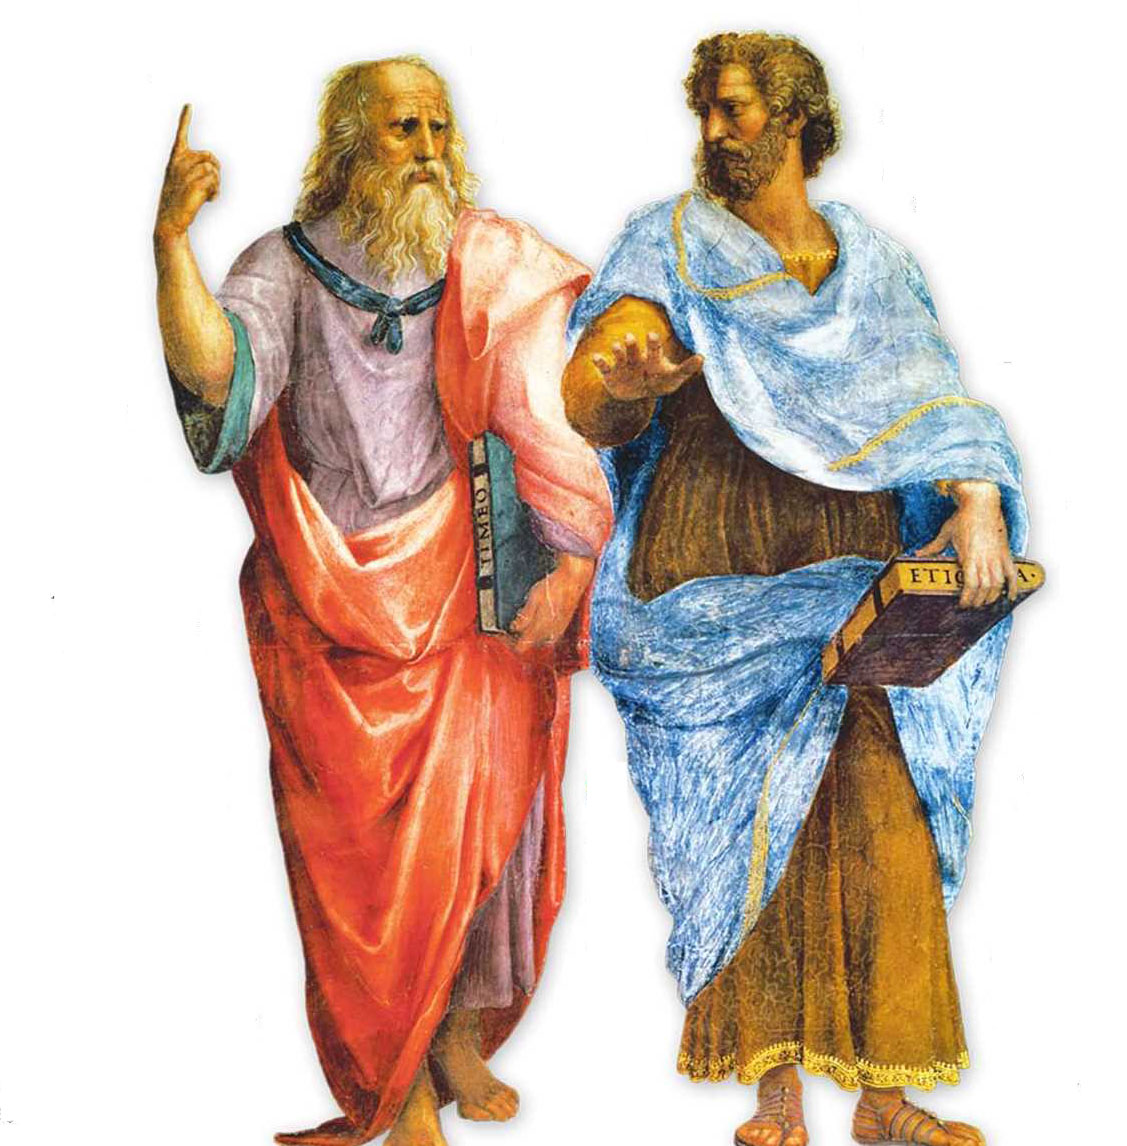 فلسفه سیاسى افلاطون و ارسطو